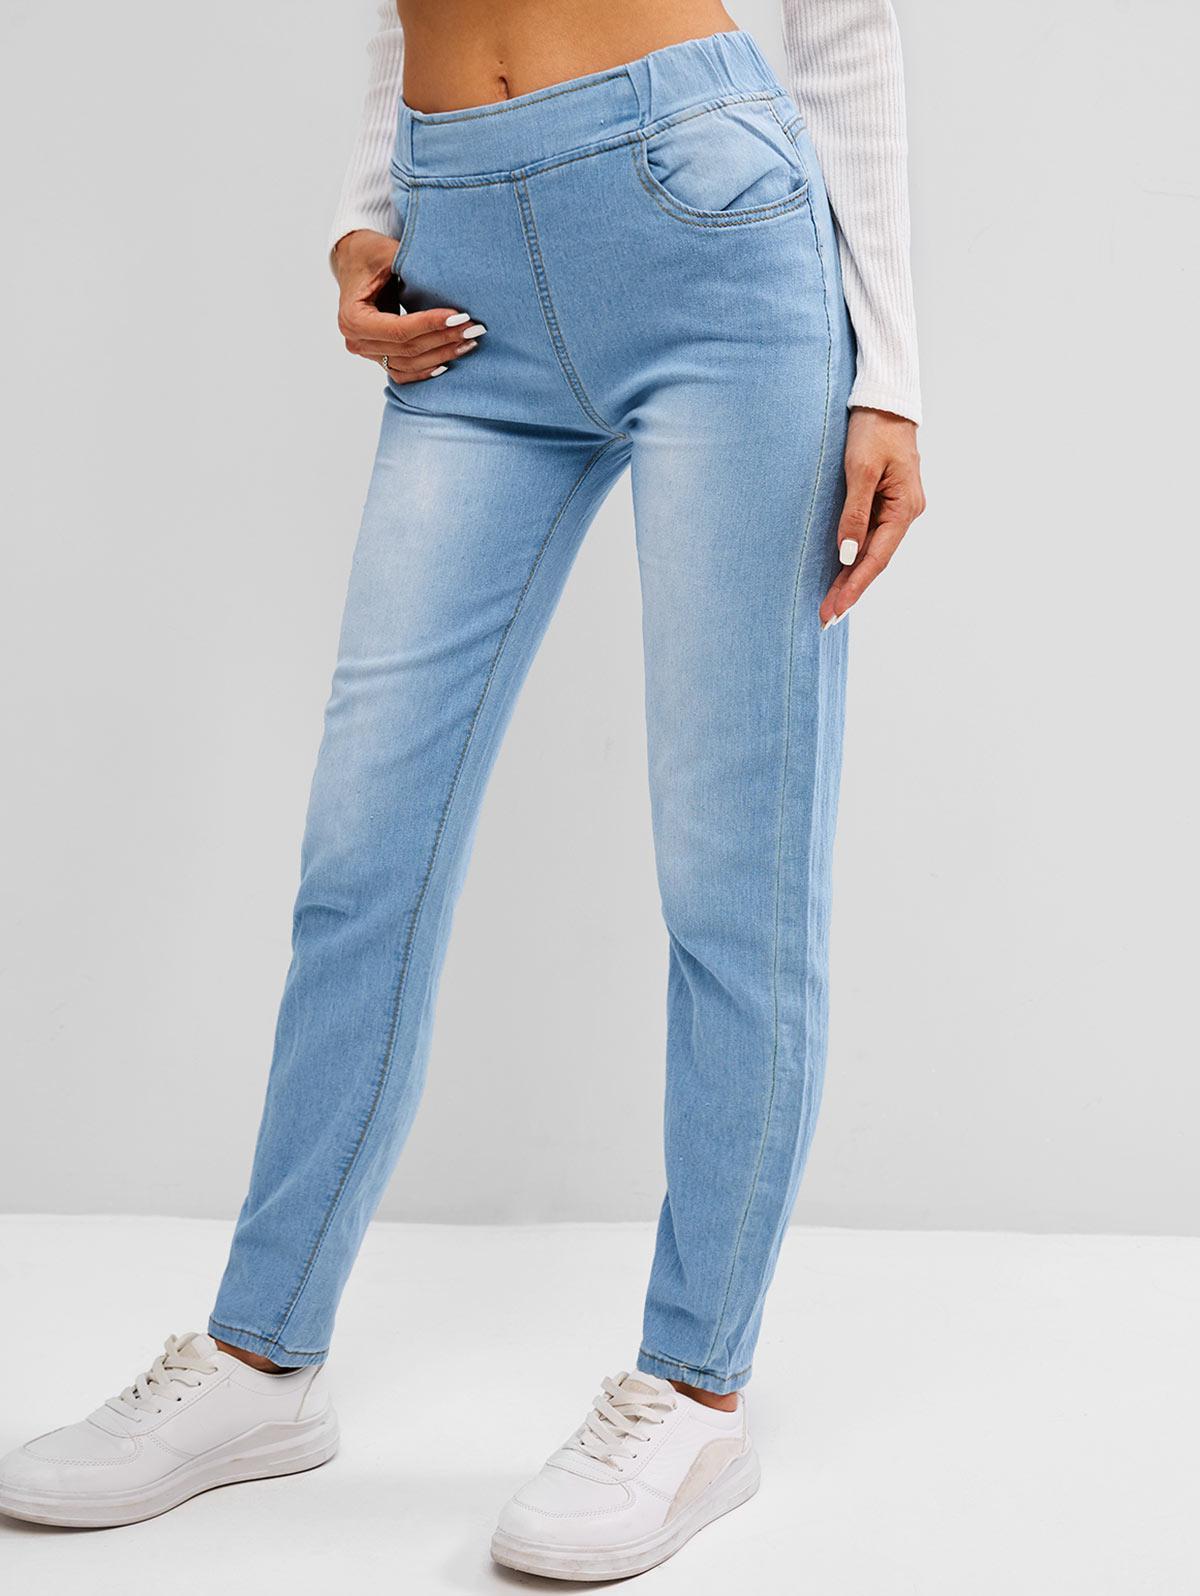 Pockets Light Wash Skinny Jeans